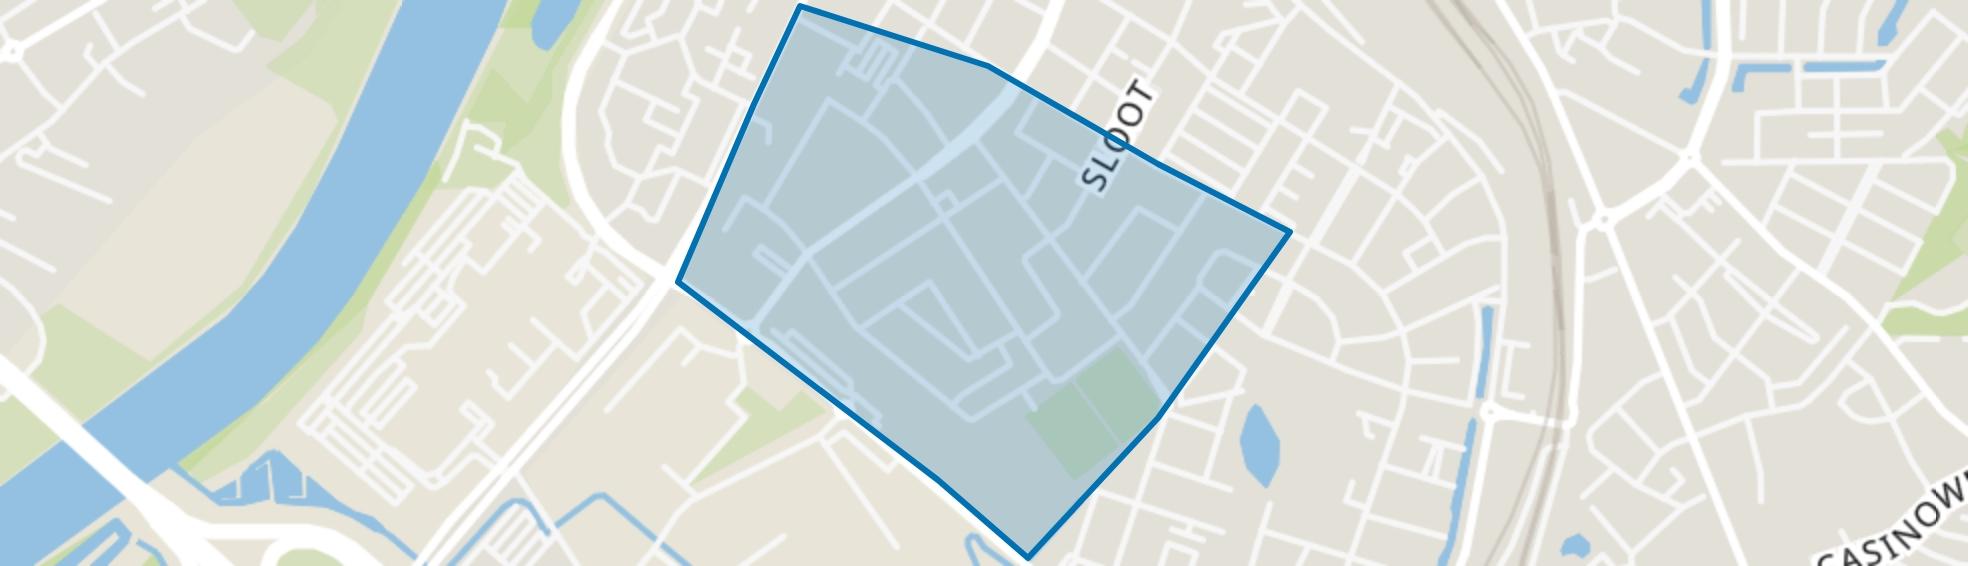 Hagerhof-oost, Venlo map